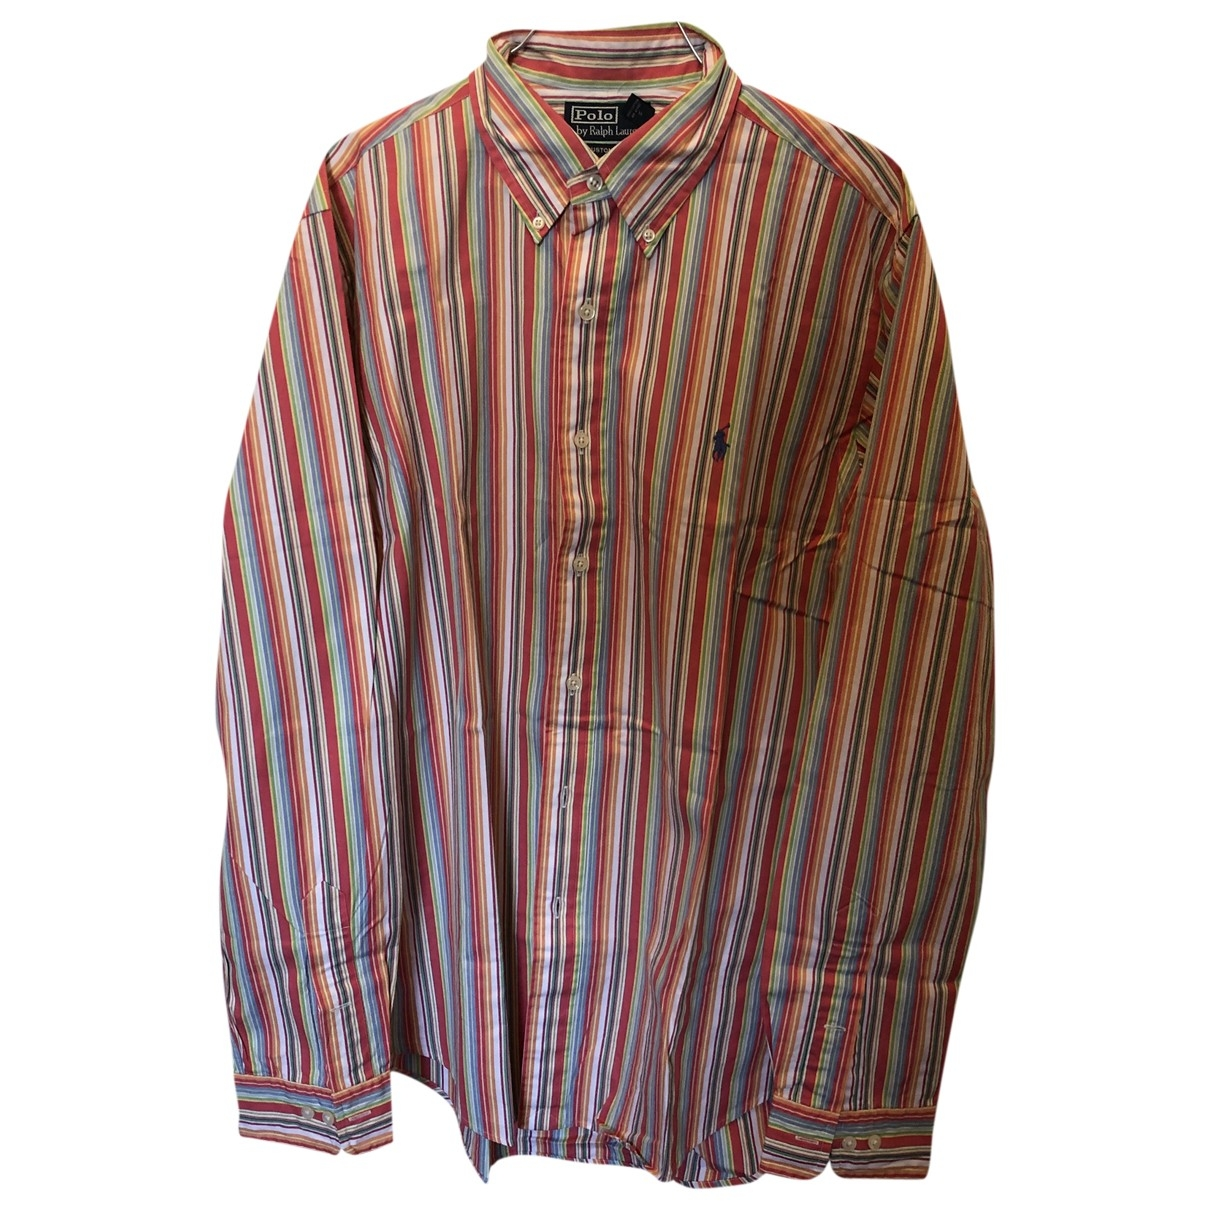 Polo Ralph Lauren Polo ajuste manches longues Hemden in Baumwolle